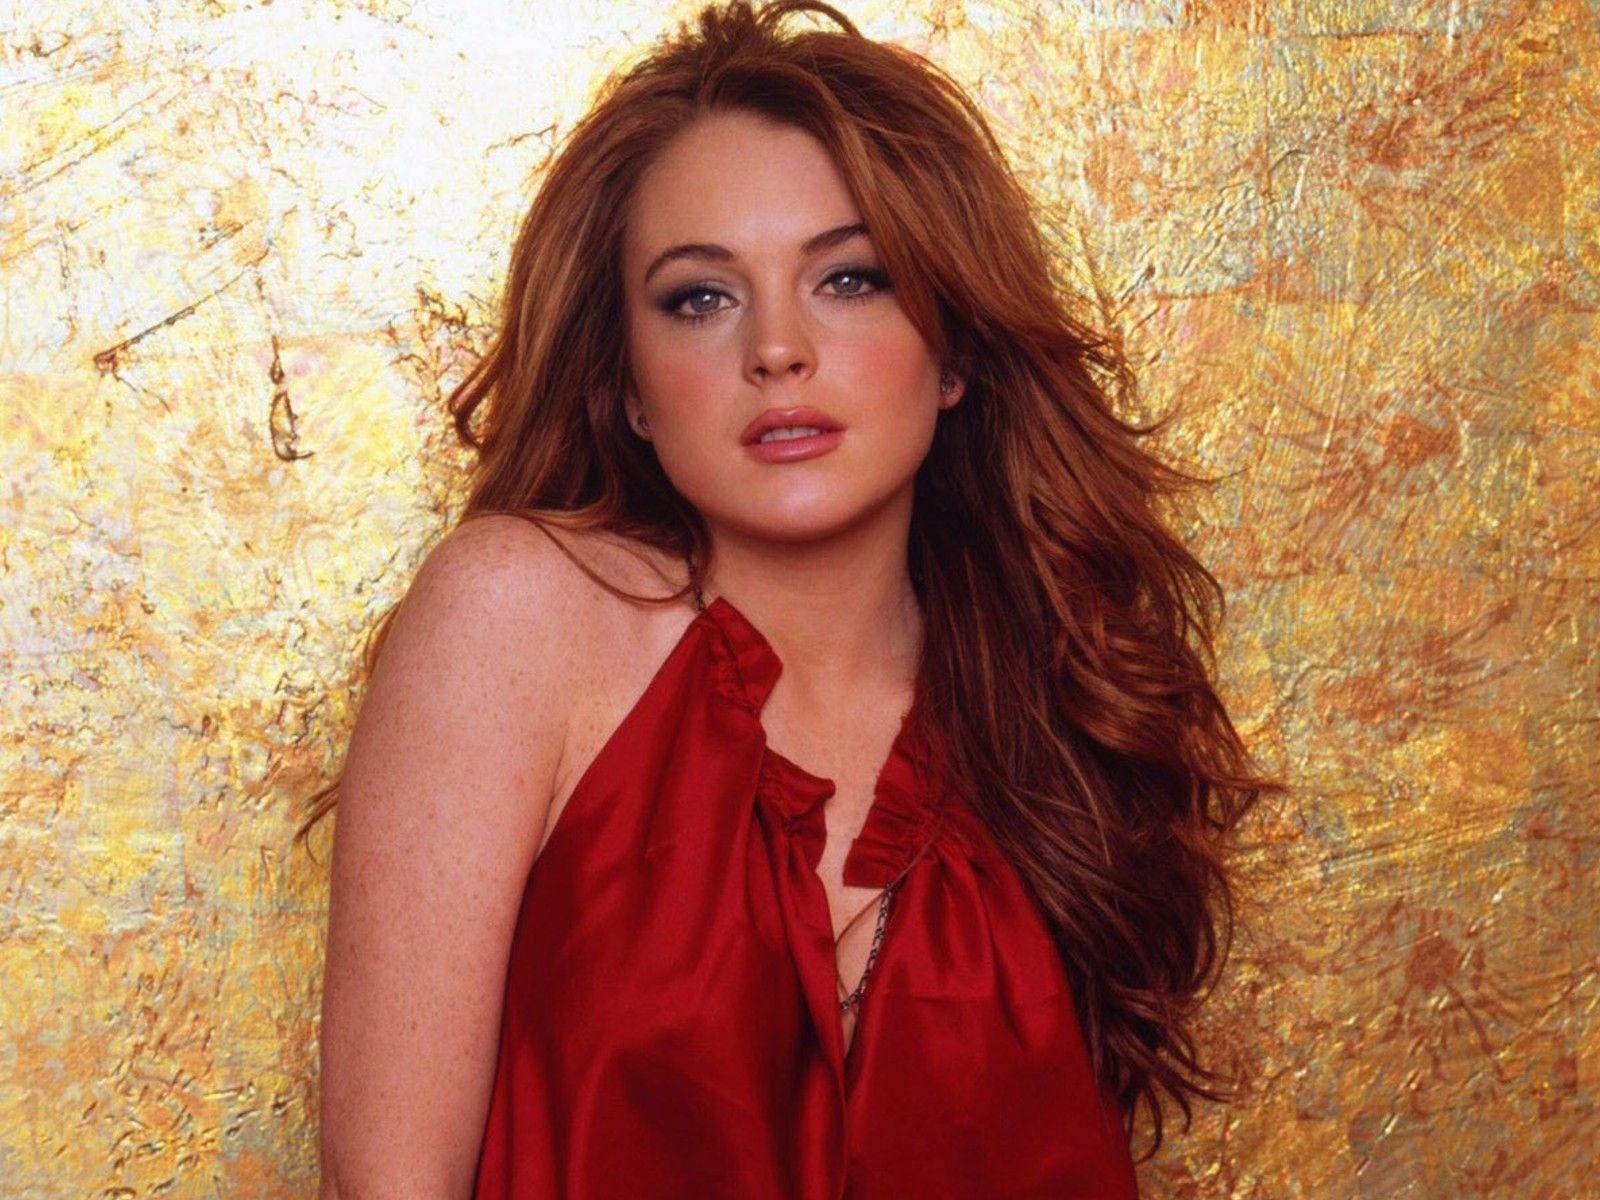 Top Wallpapers Young Lindsay Lohan Redhead Hd Wallpaper